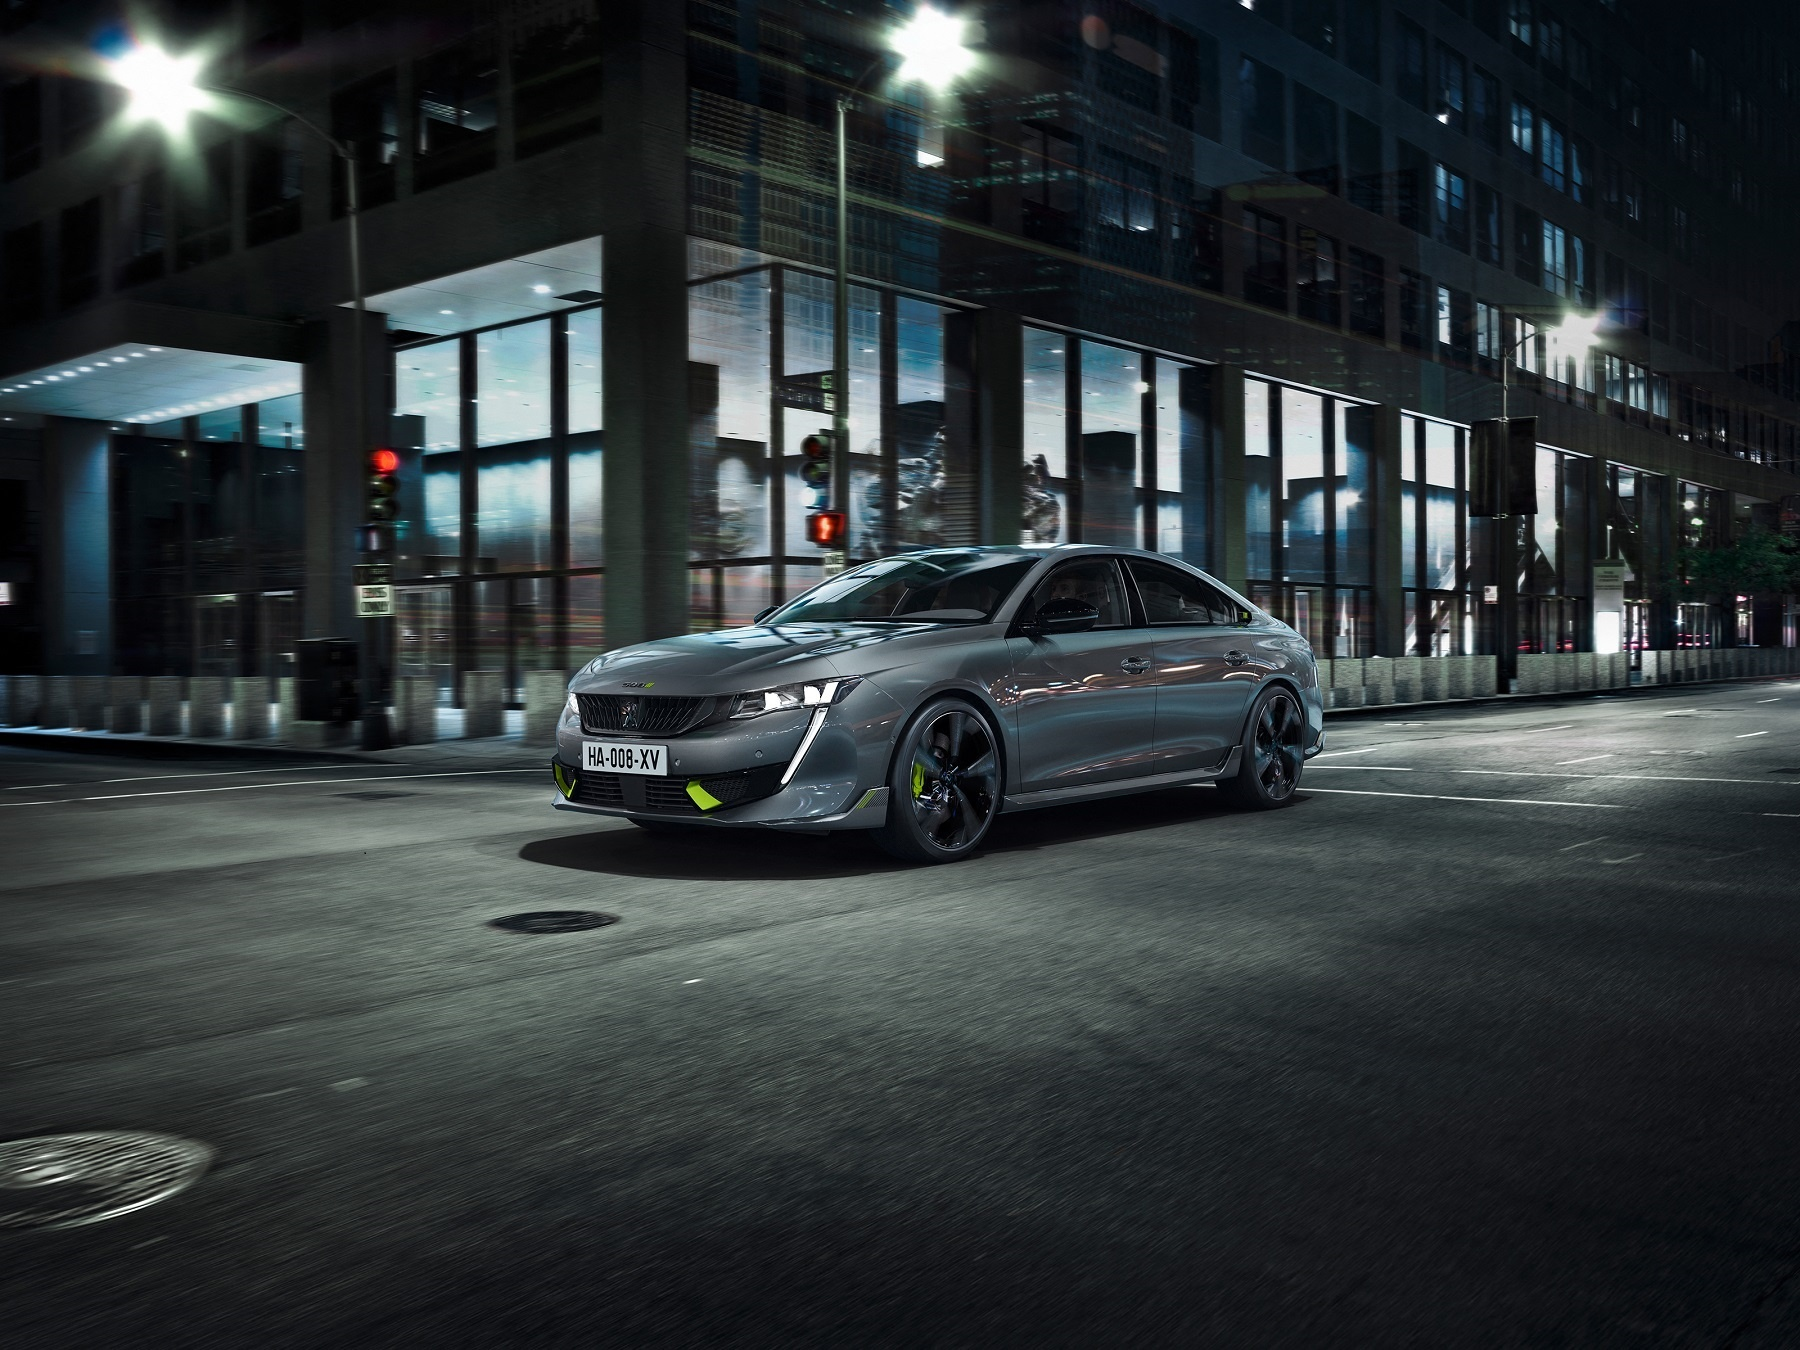 508 Peugeot Sport Engineered: Pioneering Performance Again